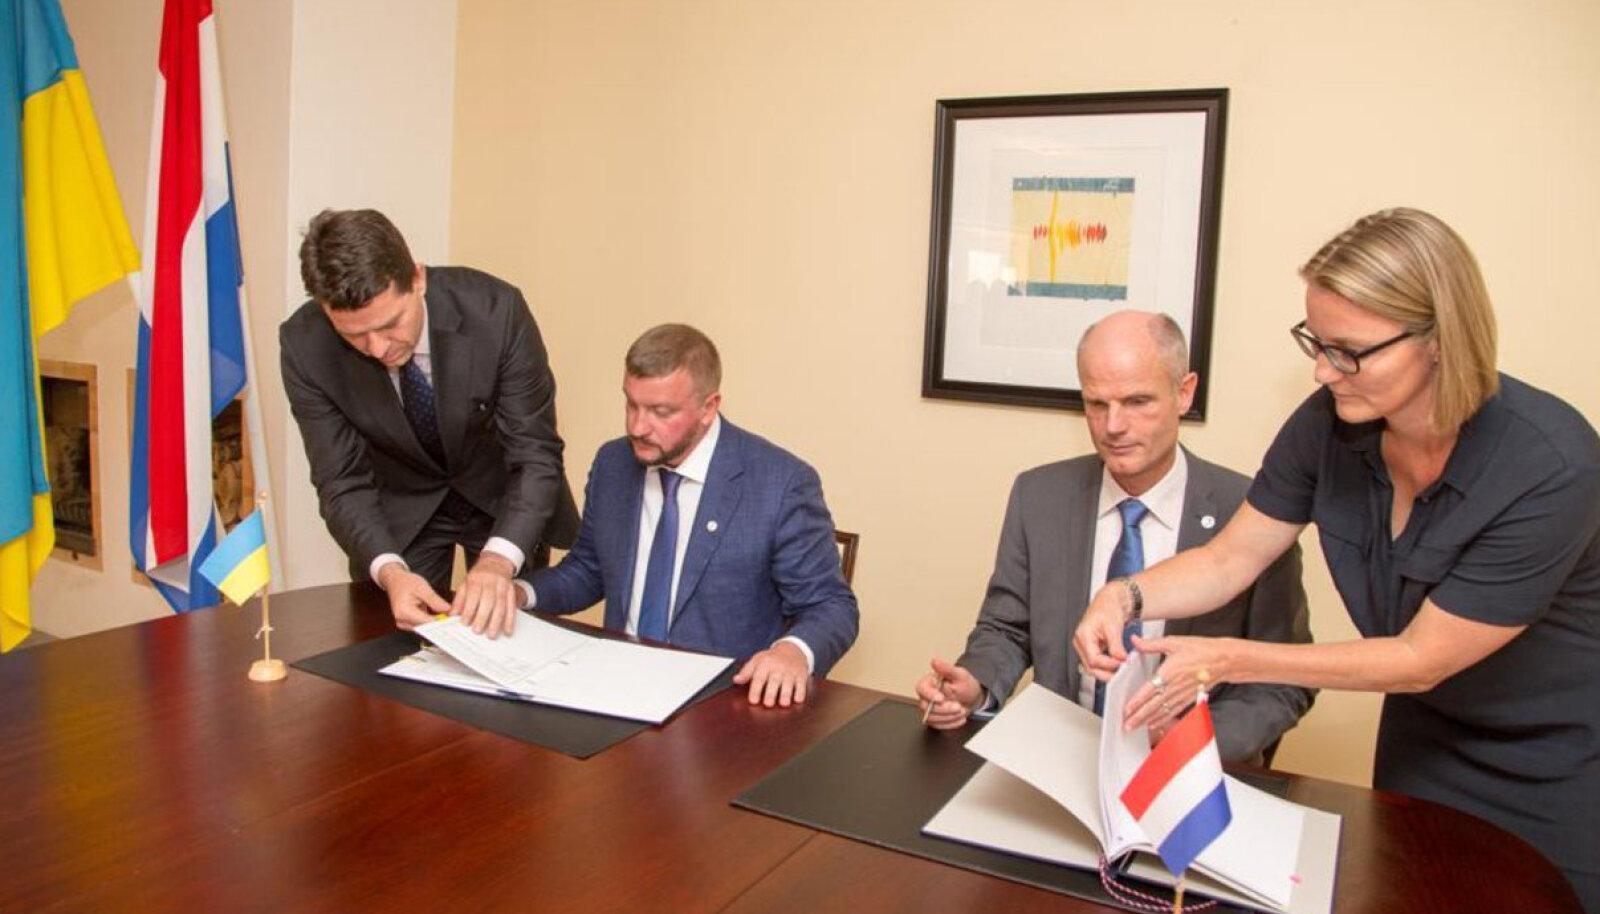 Hollandi-Ukraina kokkuleppe allkirjastamine Tallinnas